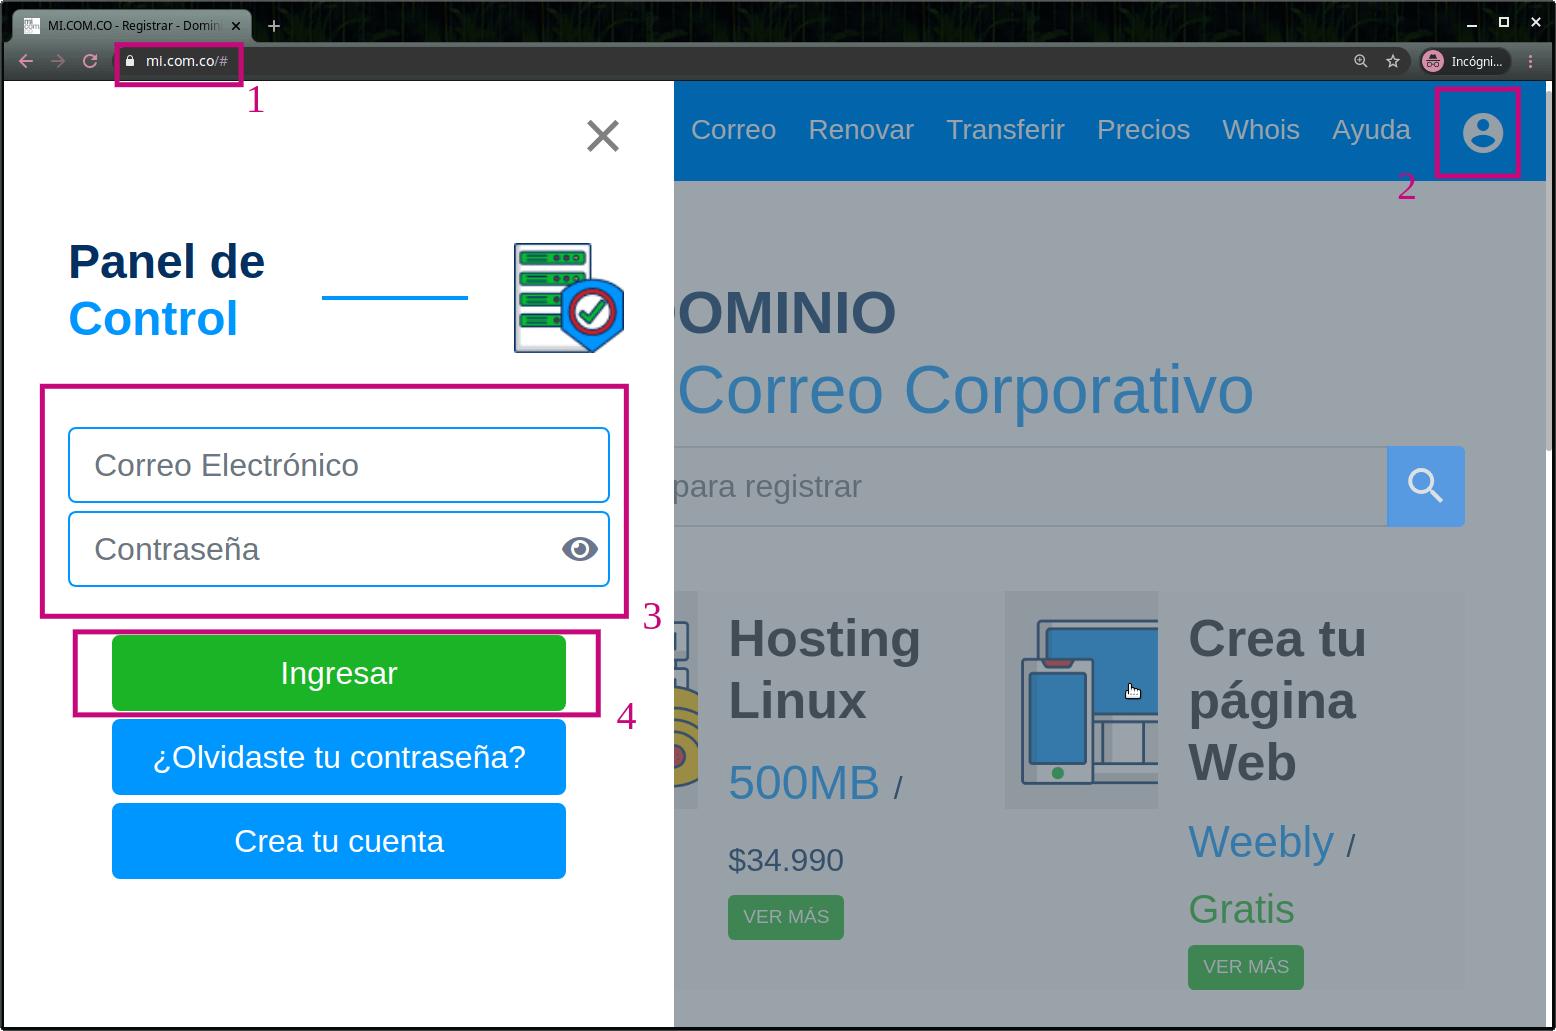 Ingreso a mi.com.co